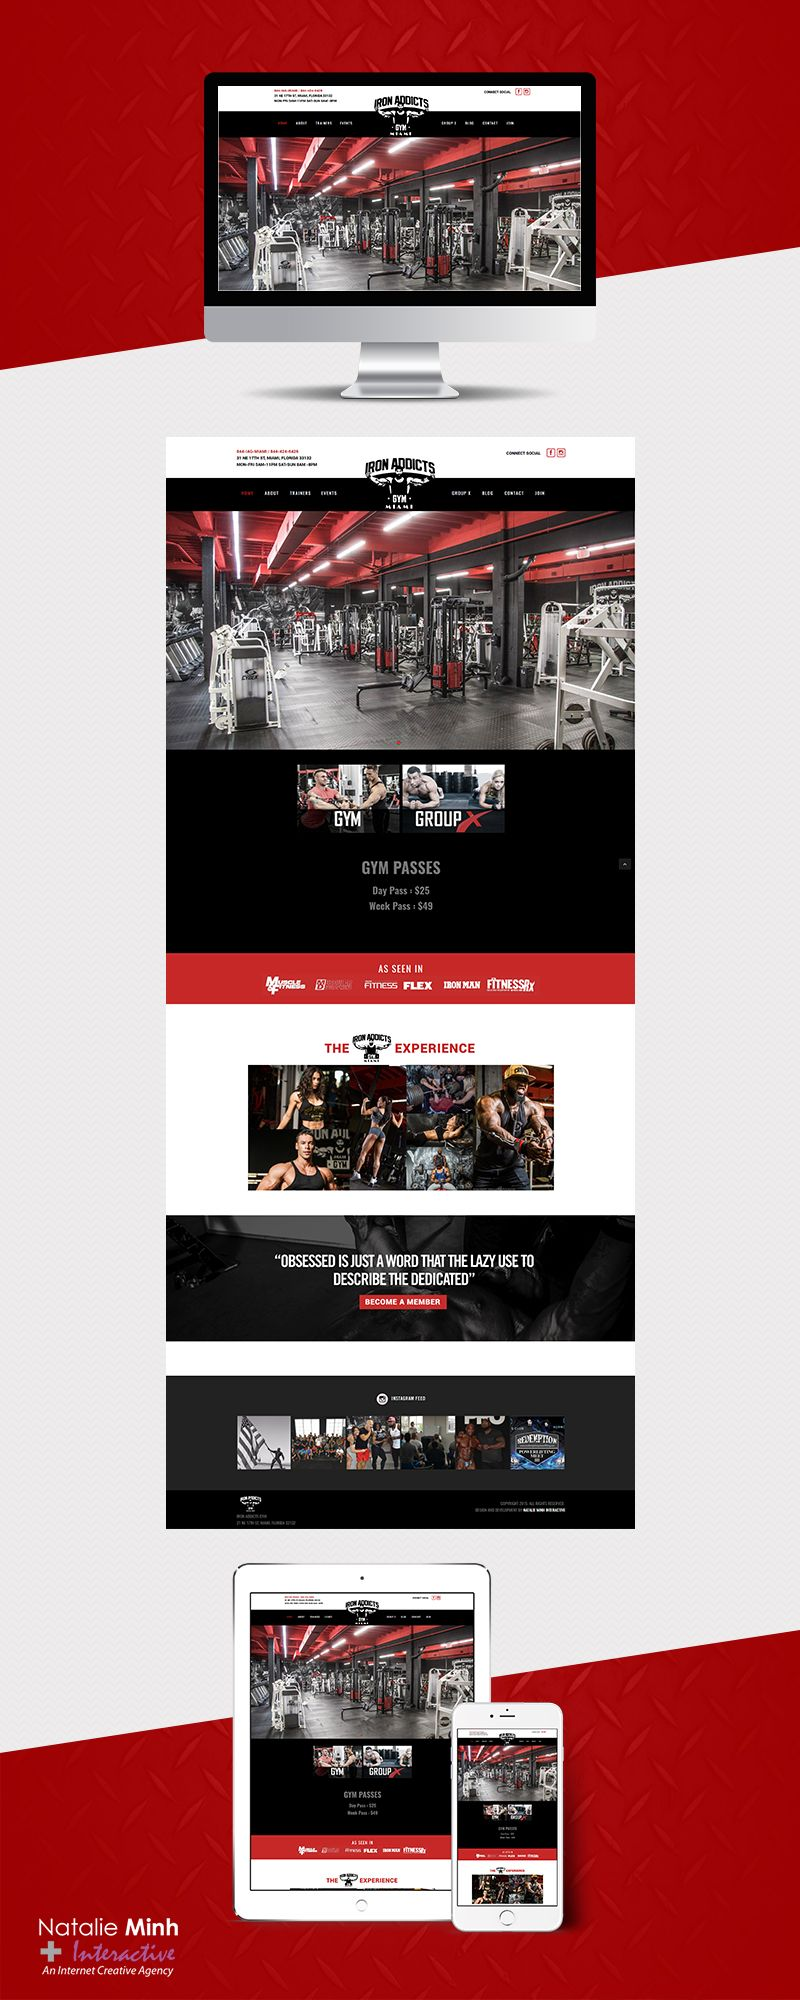 Iron Addicts Gym Miami Website Design and Development by Natalie Minh Interactive www.natalieminhinteractive.com